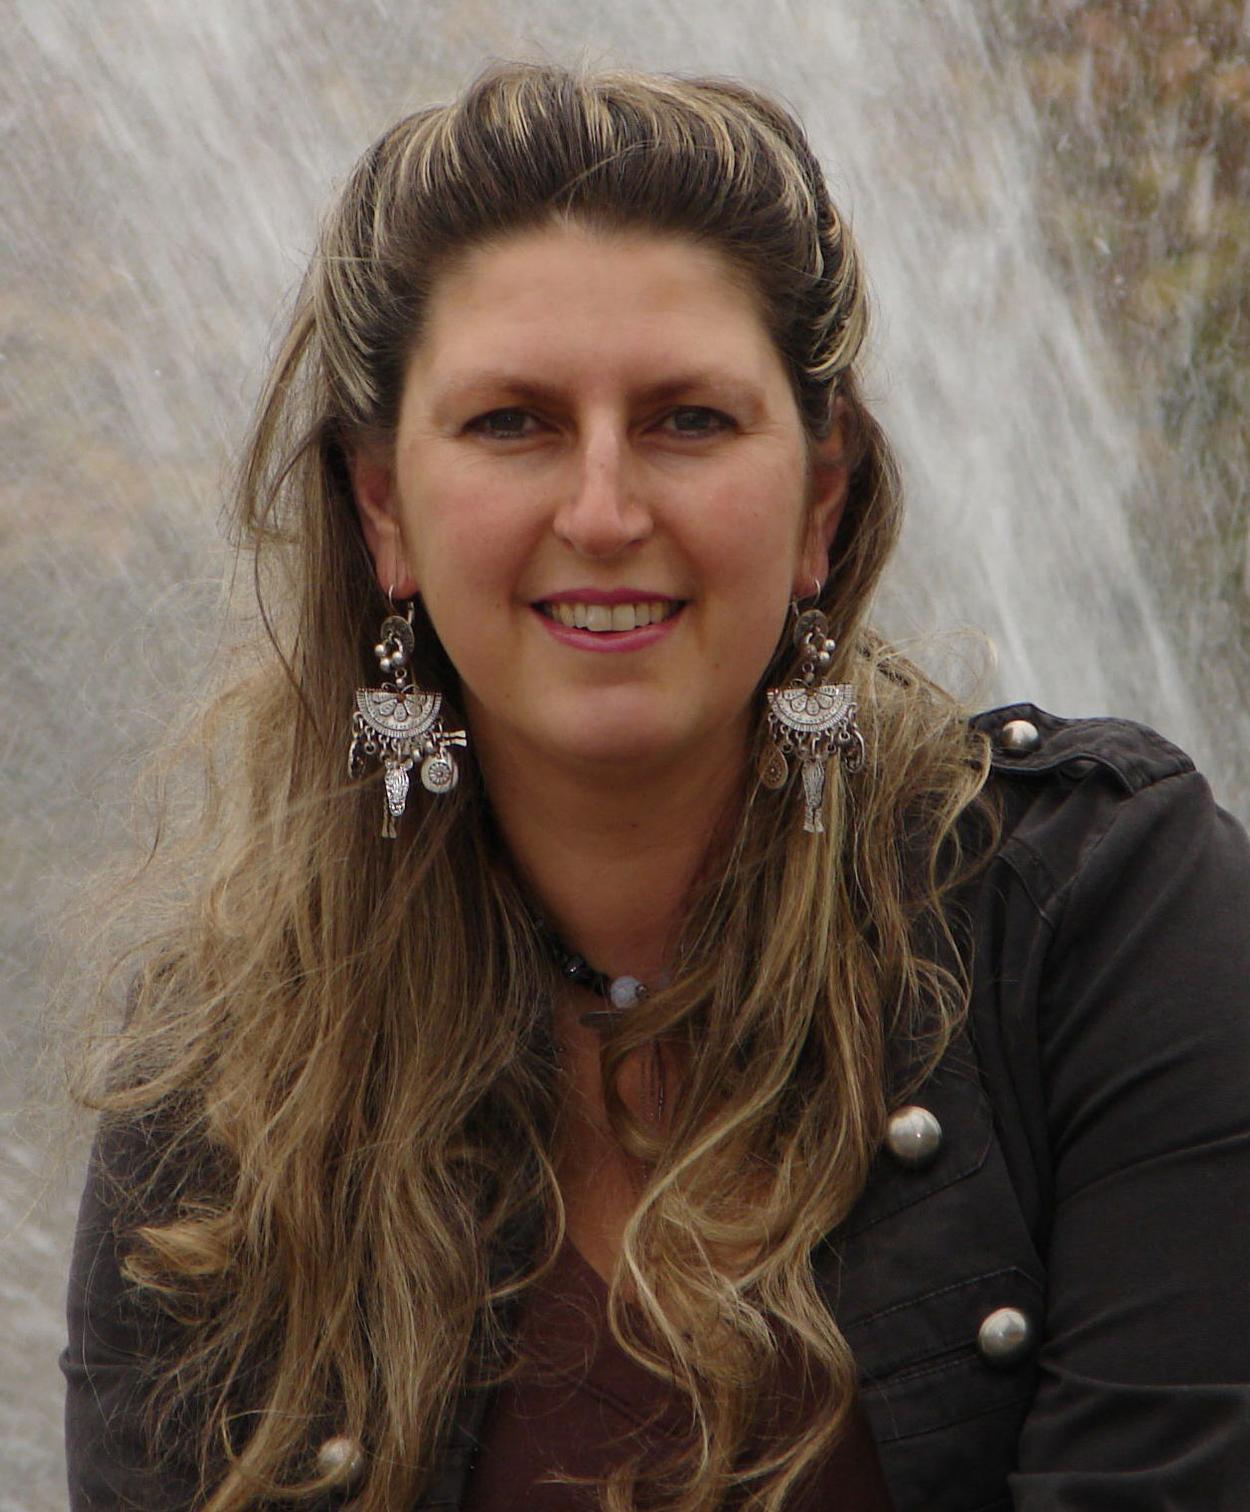 Shamanic teacher and practitioner Imelda Almqvist offers courses where art meets shamanism